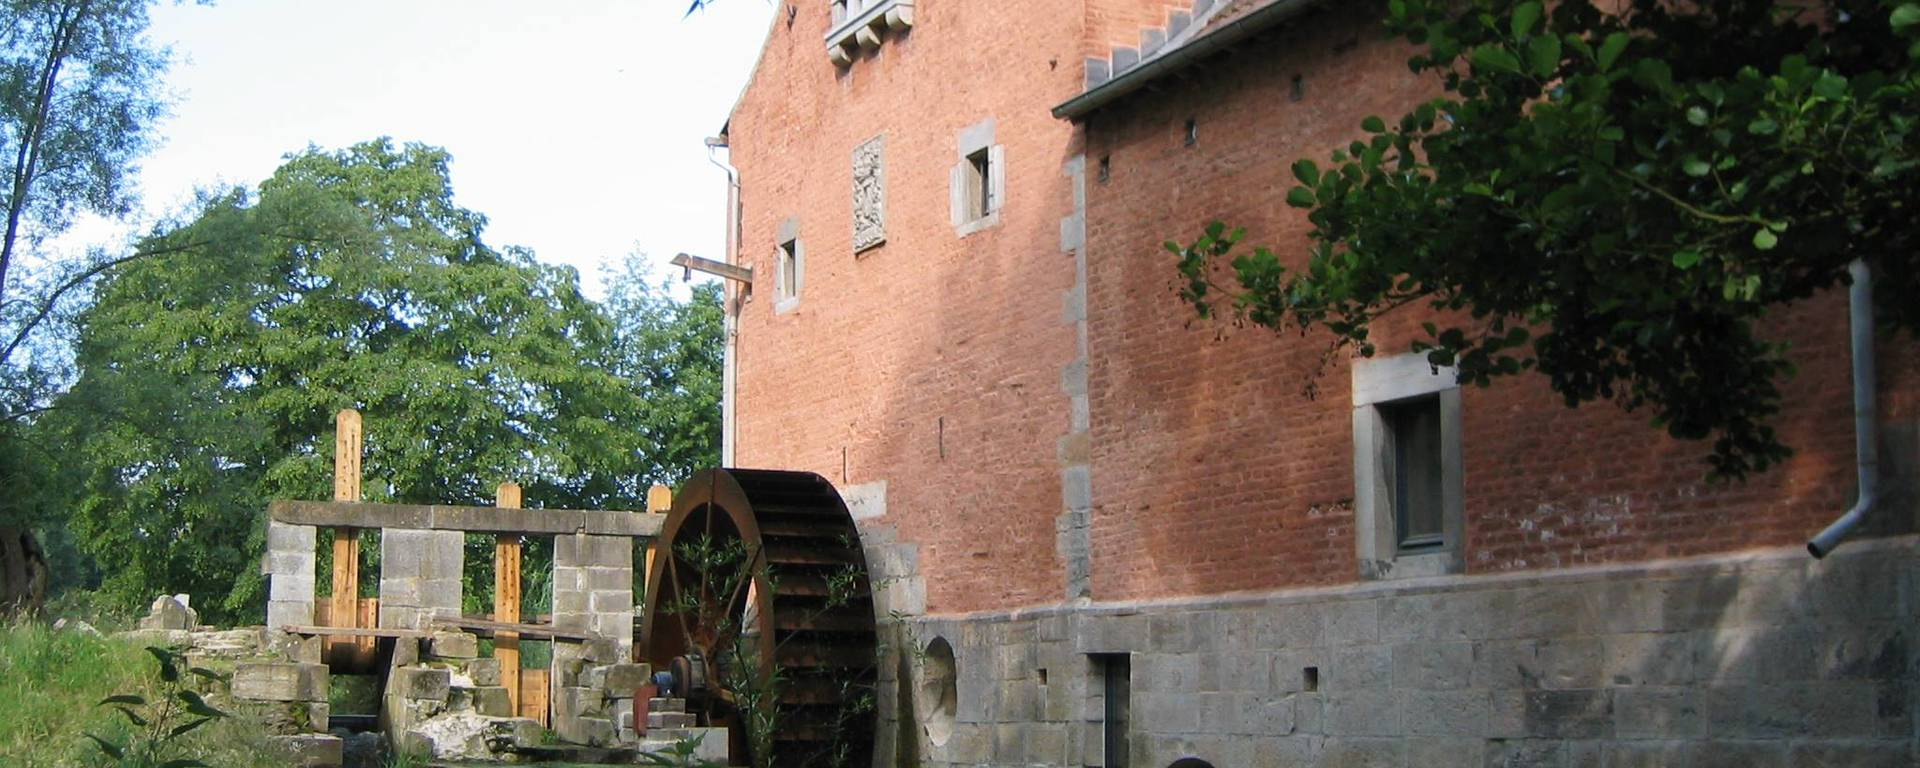 Moulin castral d'Hollogne-sur-Geer